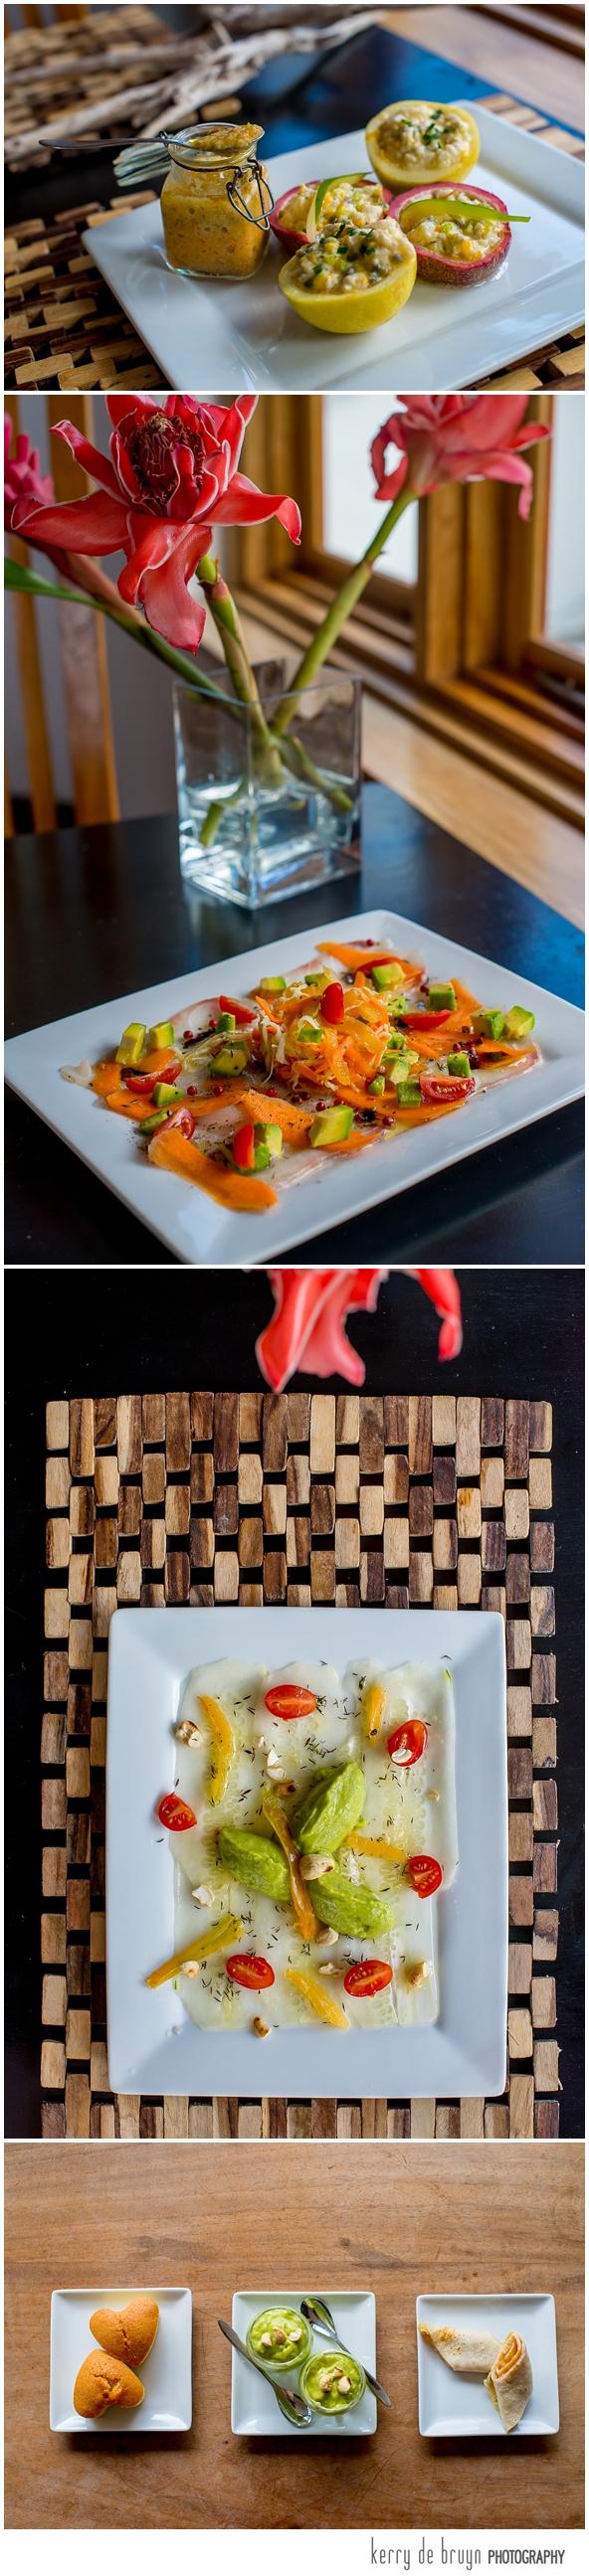 Food photographer Seychelles